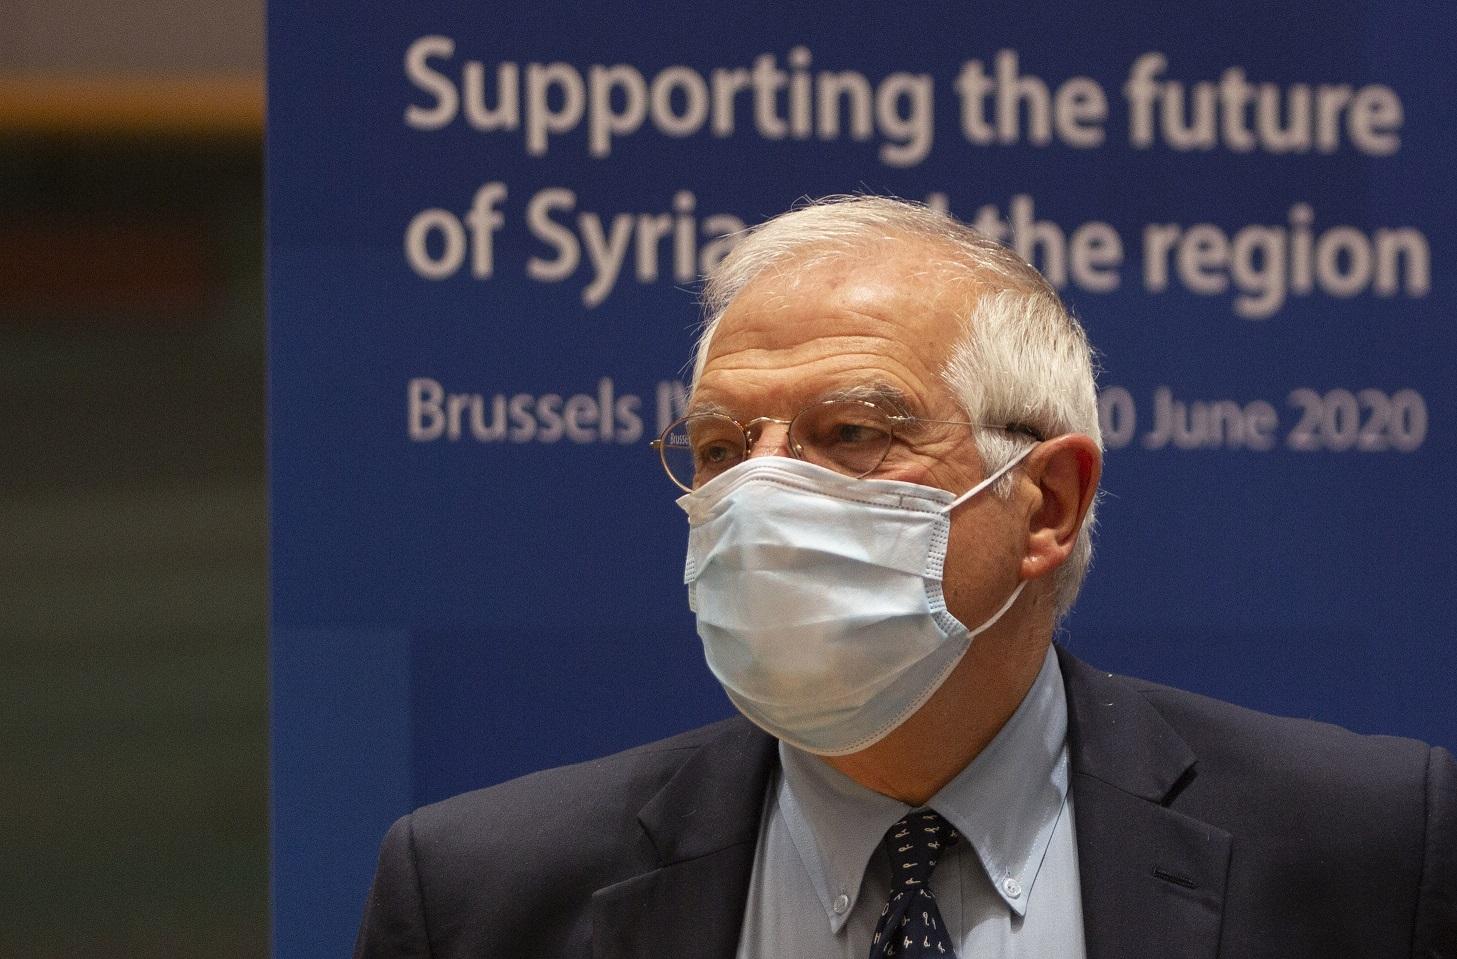 (Chefe da diplomacia europeia, Josep Borrell. Foto: Virginia Mayo / POOL / AFP)